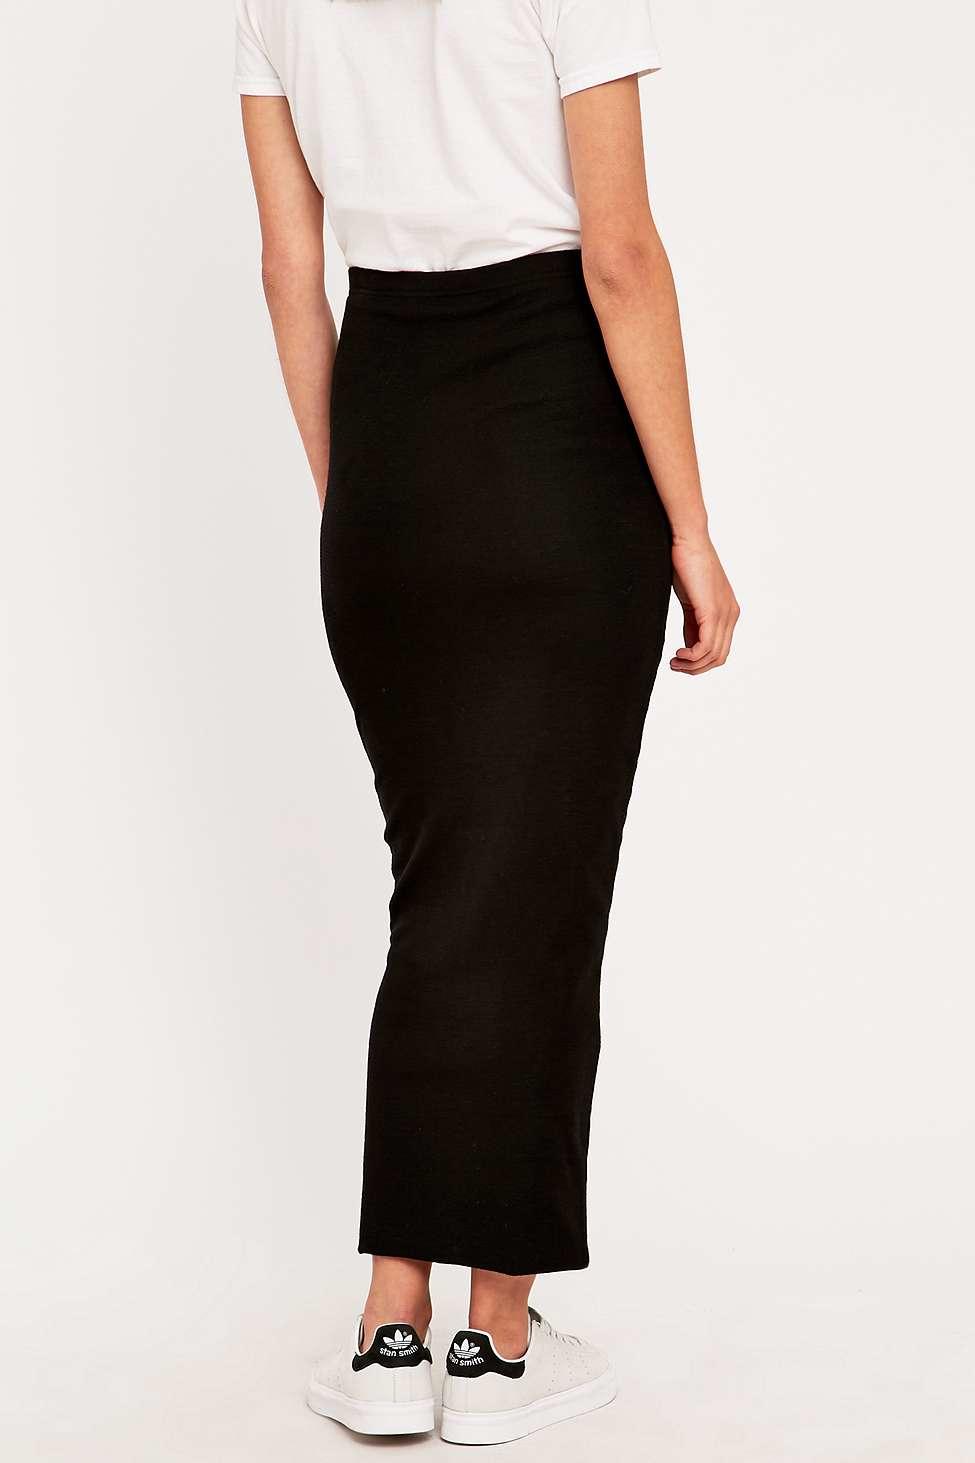 6037a3786ad libertine-libertine-black-lash-black-maxi-skirt-product-5 -354550259-normal.jpeg